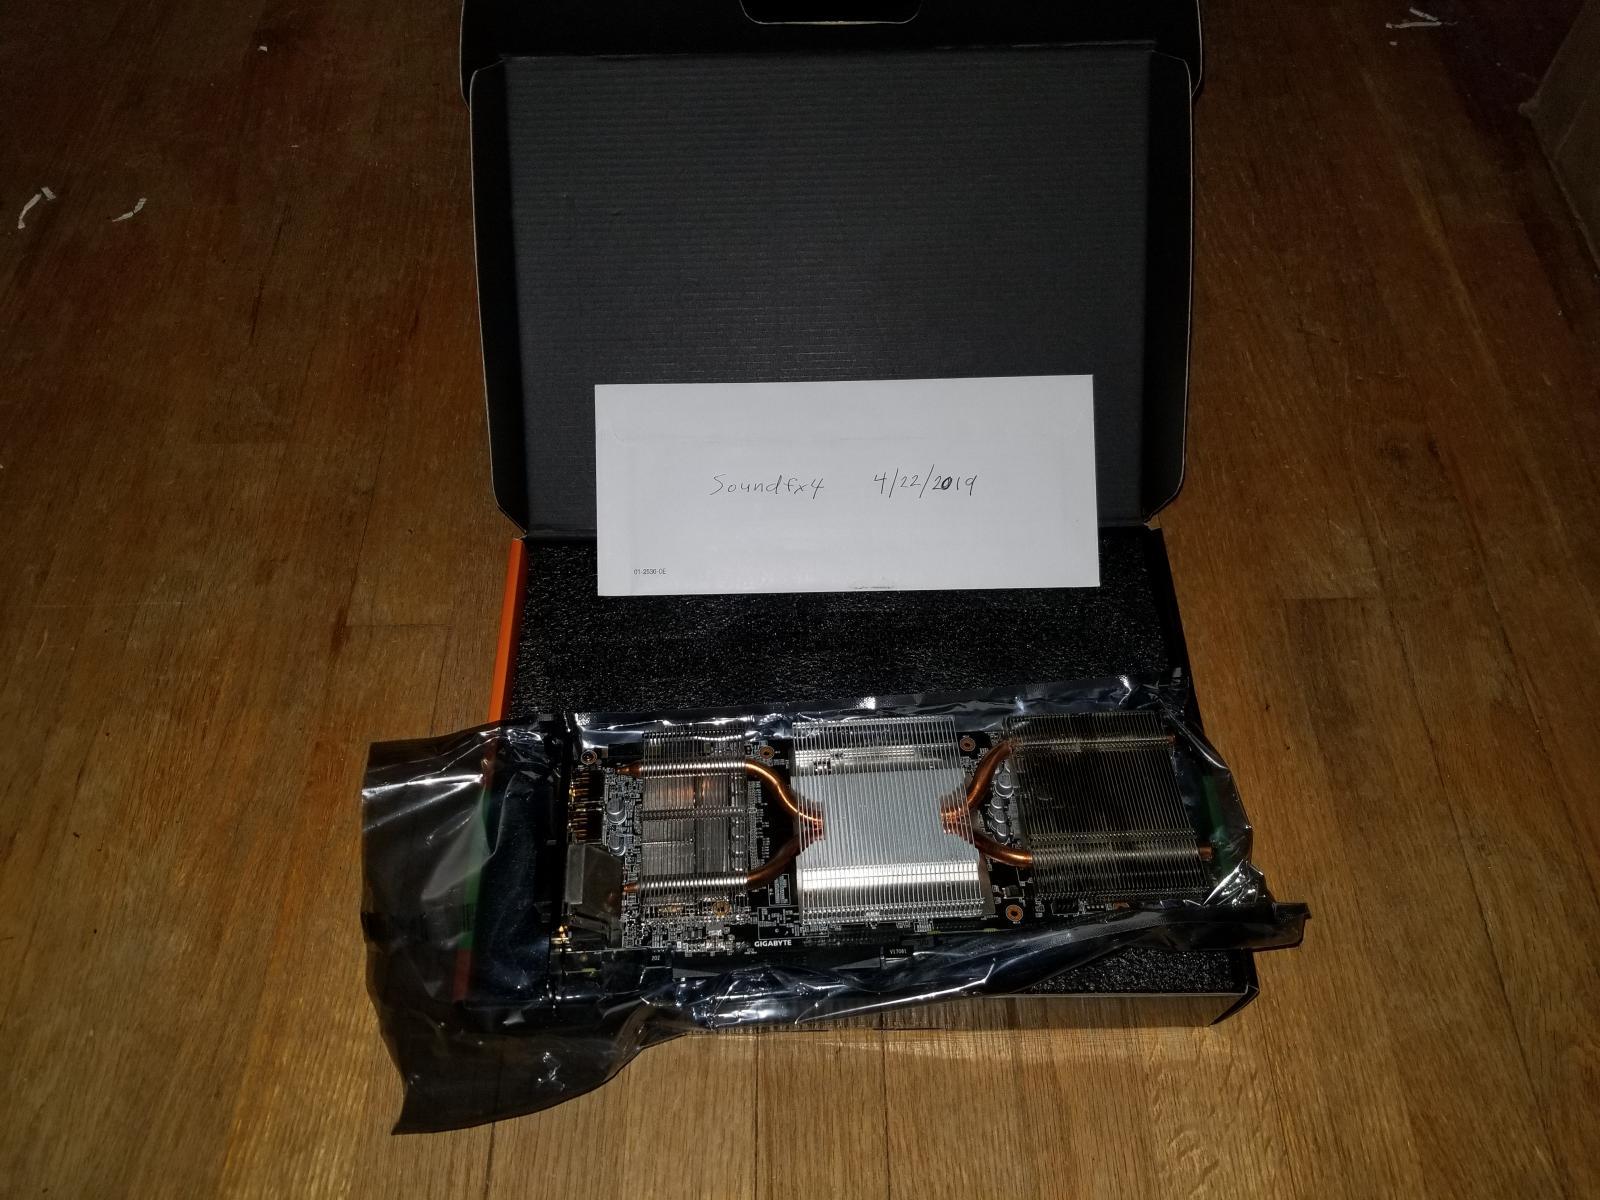 Photo of Gigabyte Geforce GTX 1070 Windforce OC edition NO FANS!